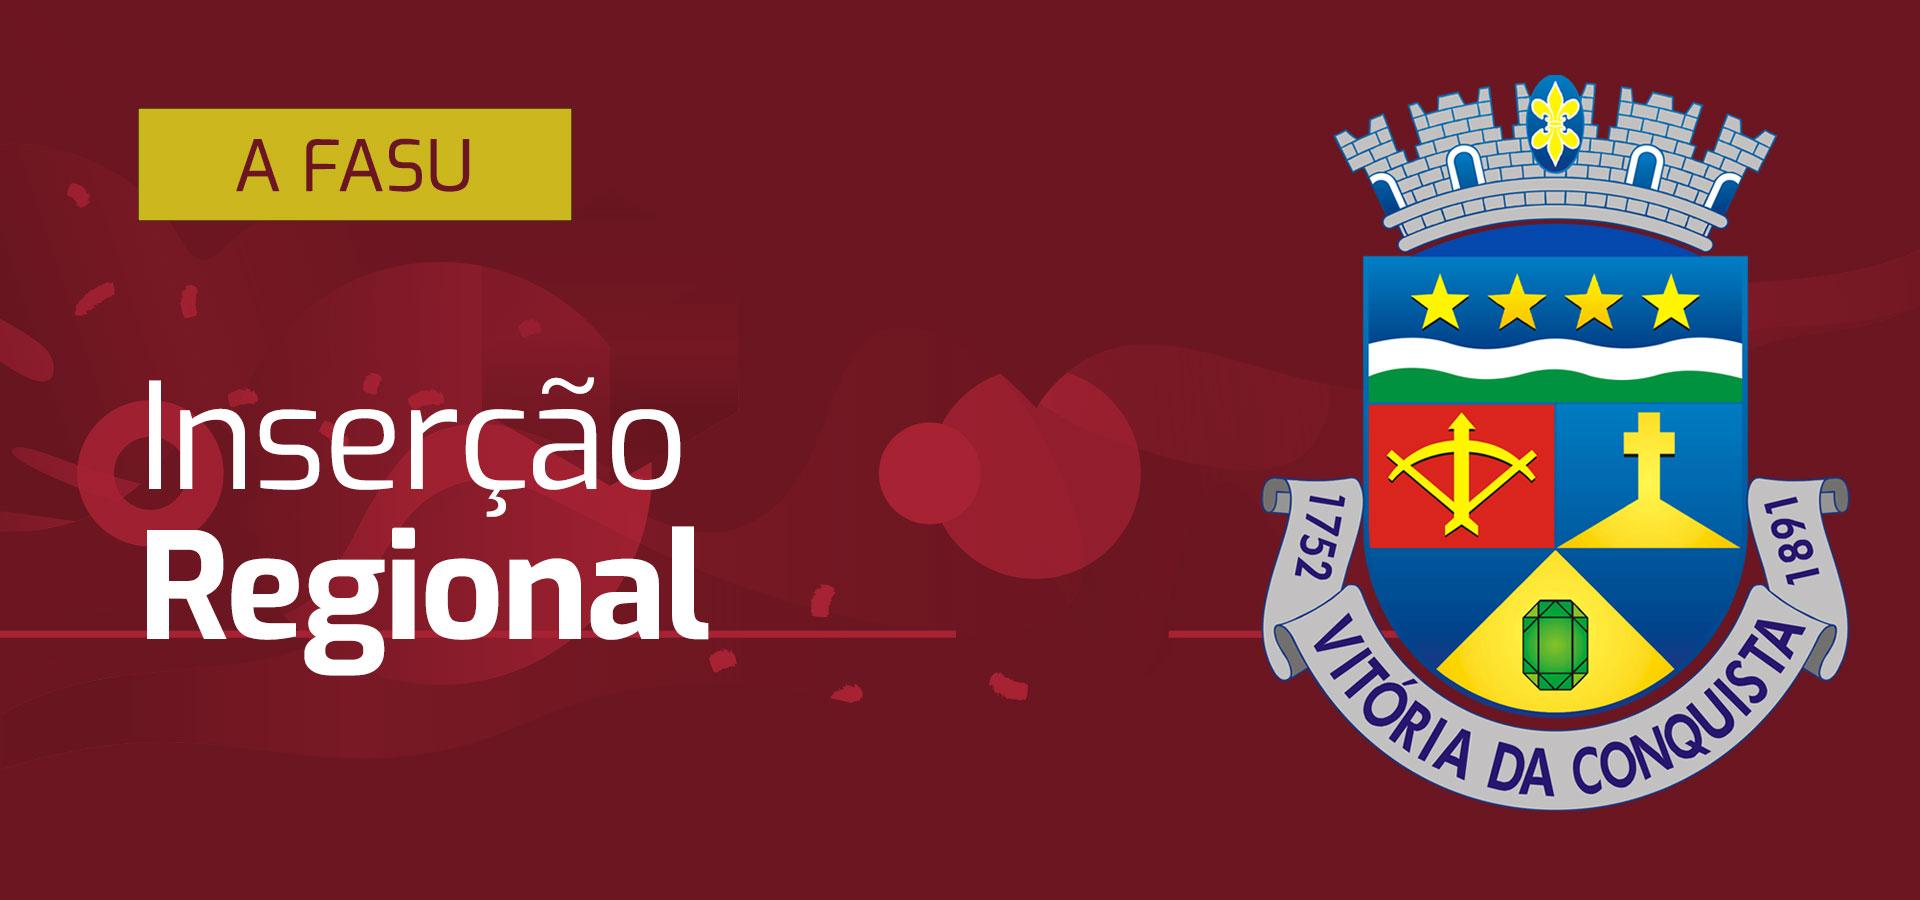 Inserção Regional - Bahia